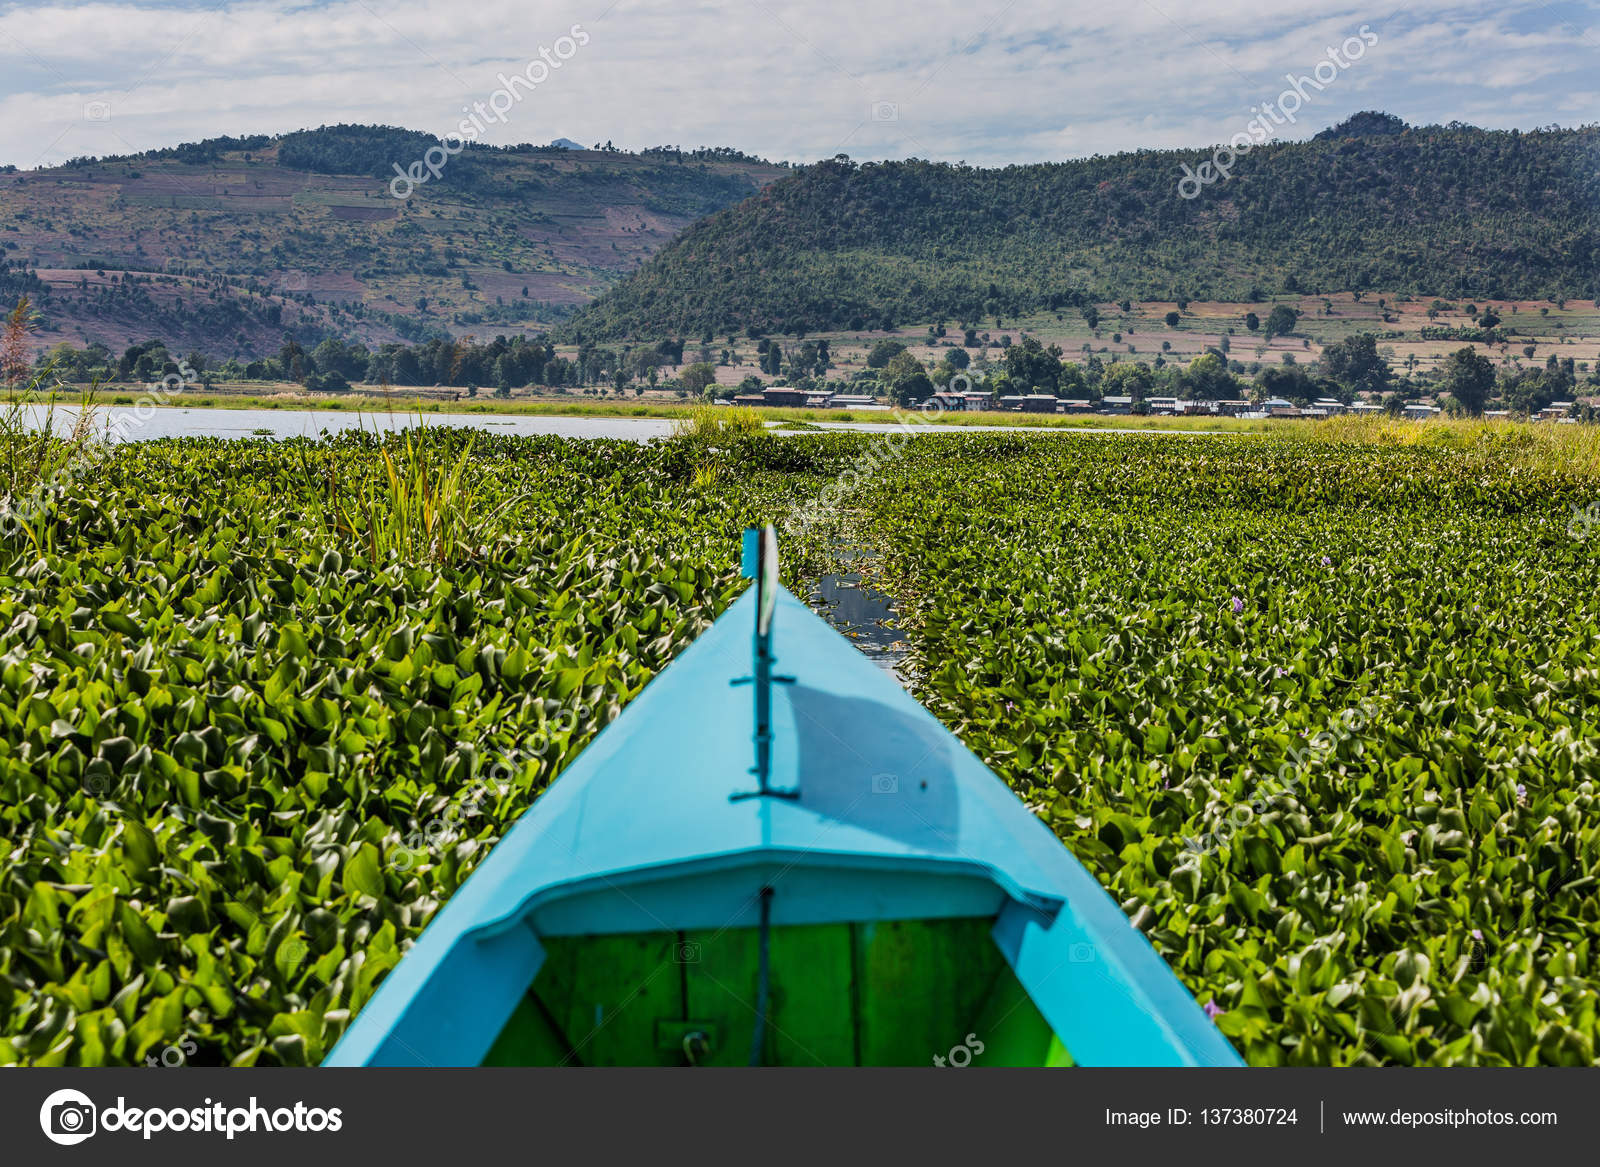 Nampan Inle Lake, Myanmar - 4 July, 2015: Boats, Traders And Loc ...